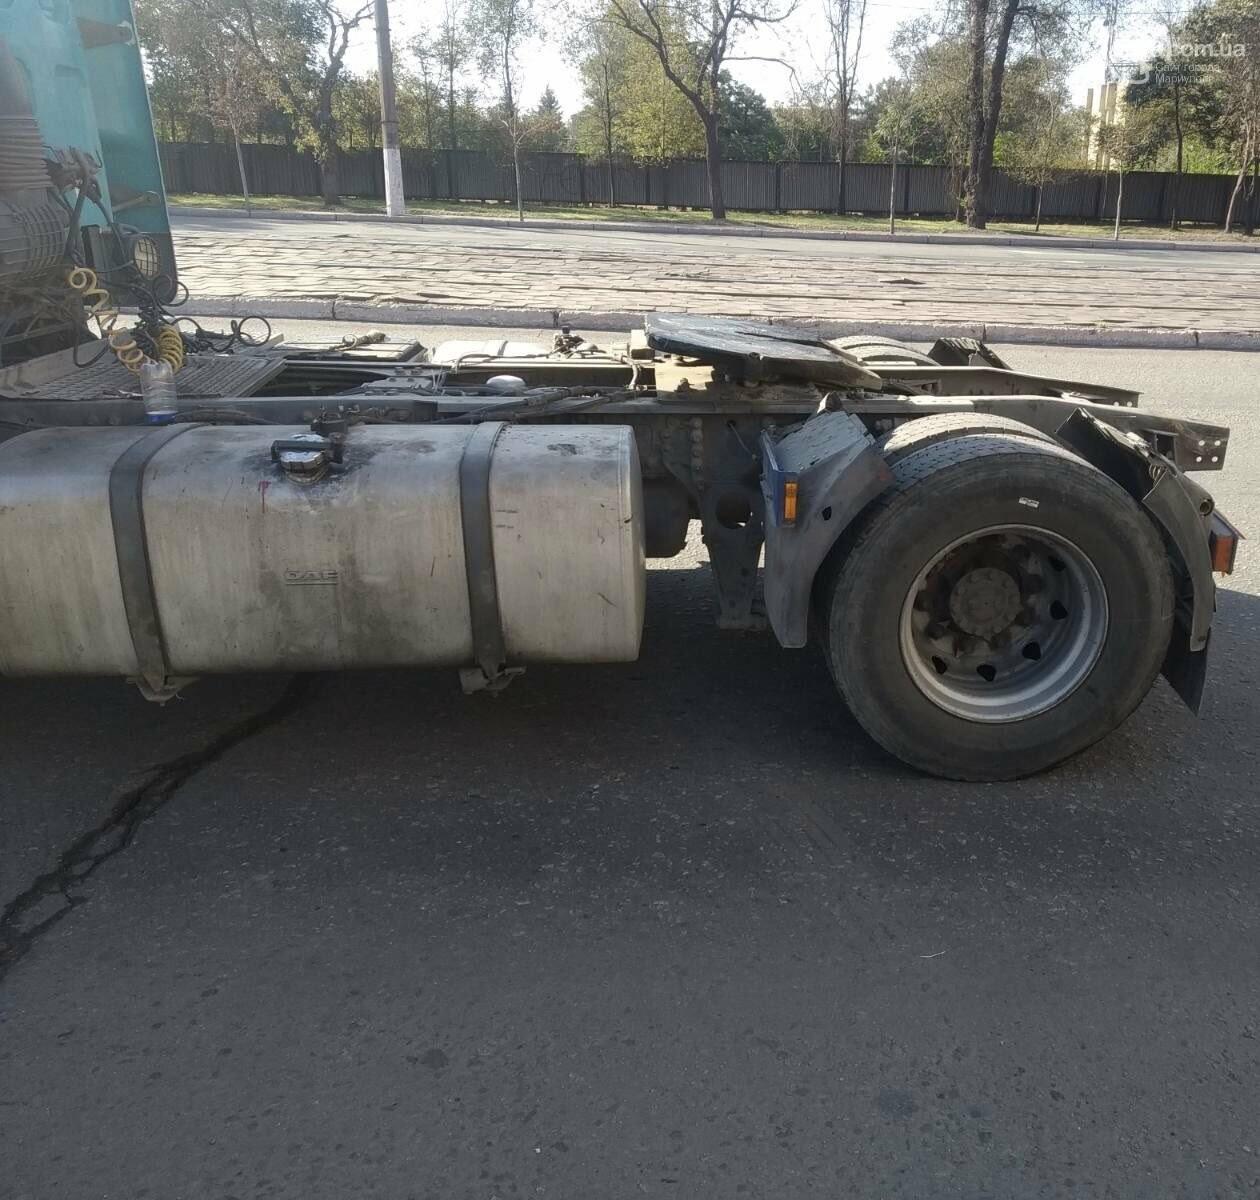 В Мариуполе прицеп оторвался у грузовика и перекрыл дорогу, - ФОТО, ВИДЕО, фото-3